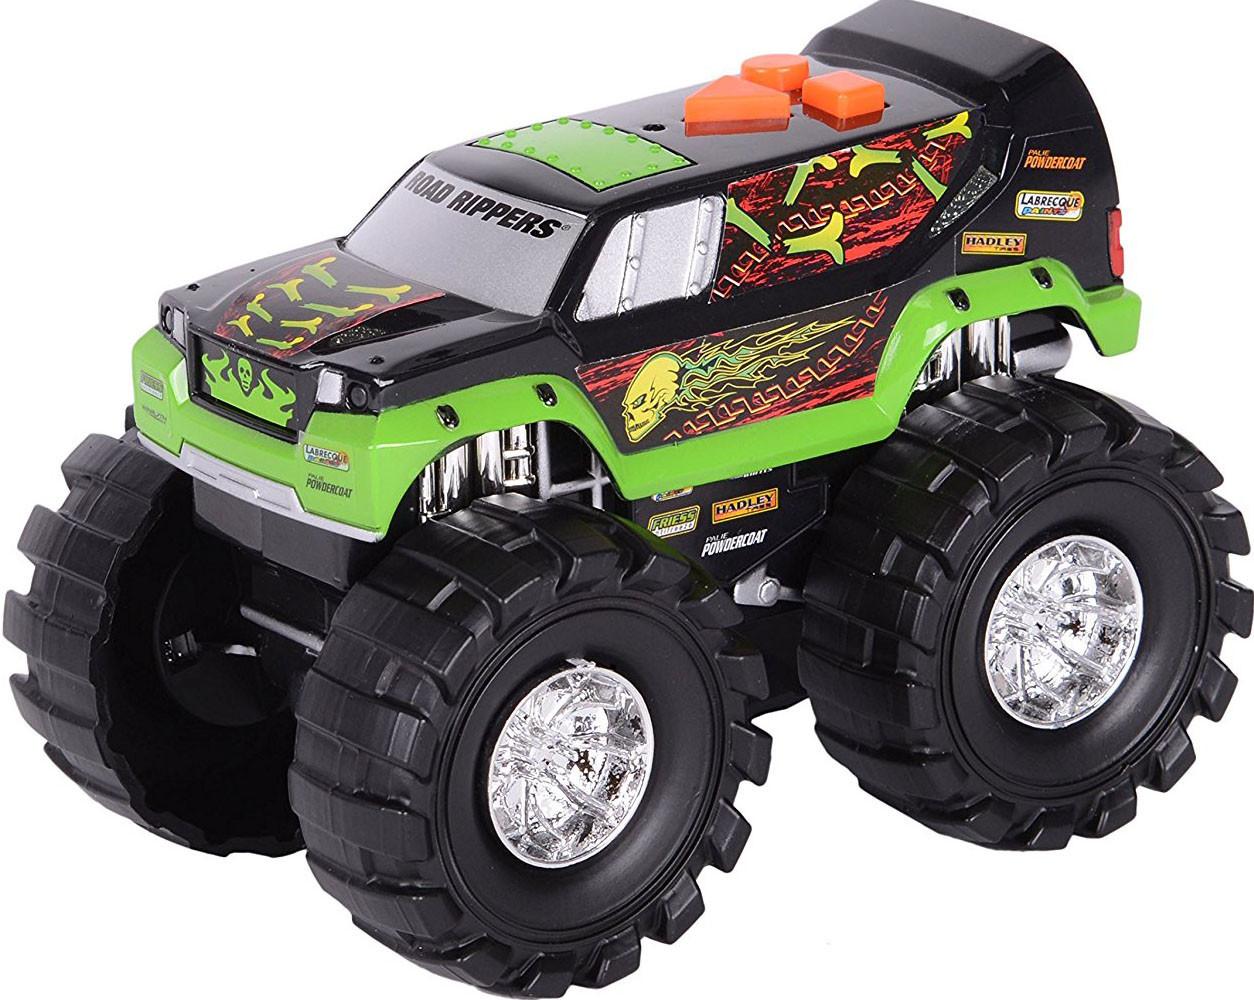 Машинка Toy State Монстер трак Armored 18 см (33096)